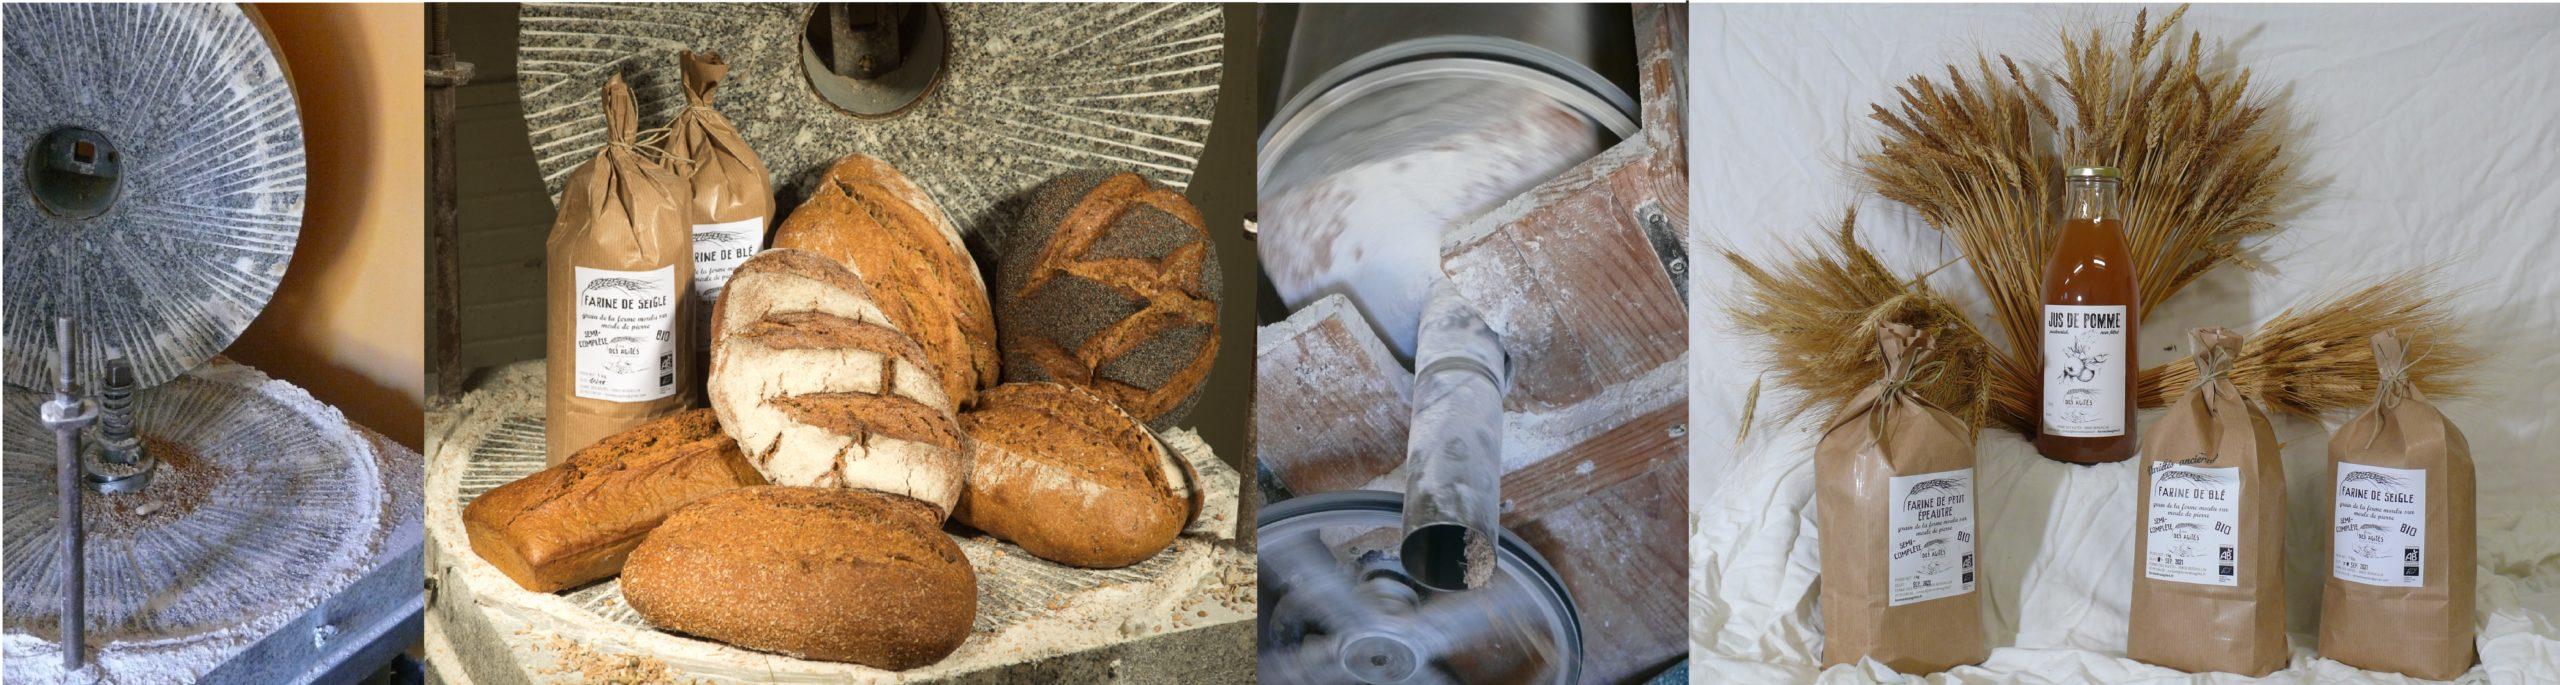 Agriculteur boulanger bio jura